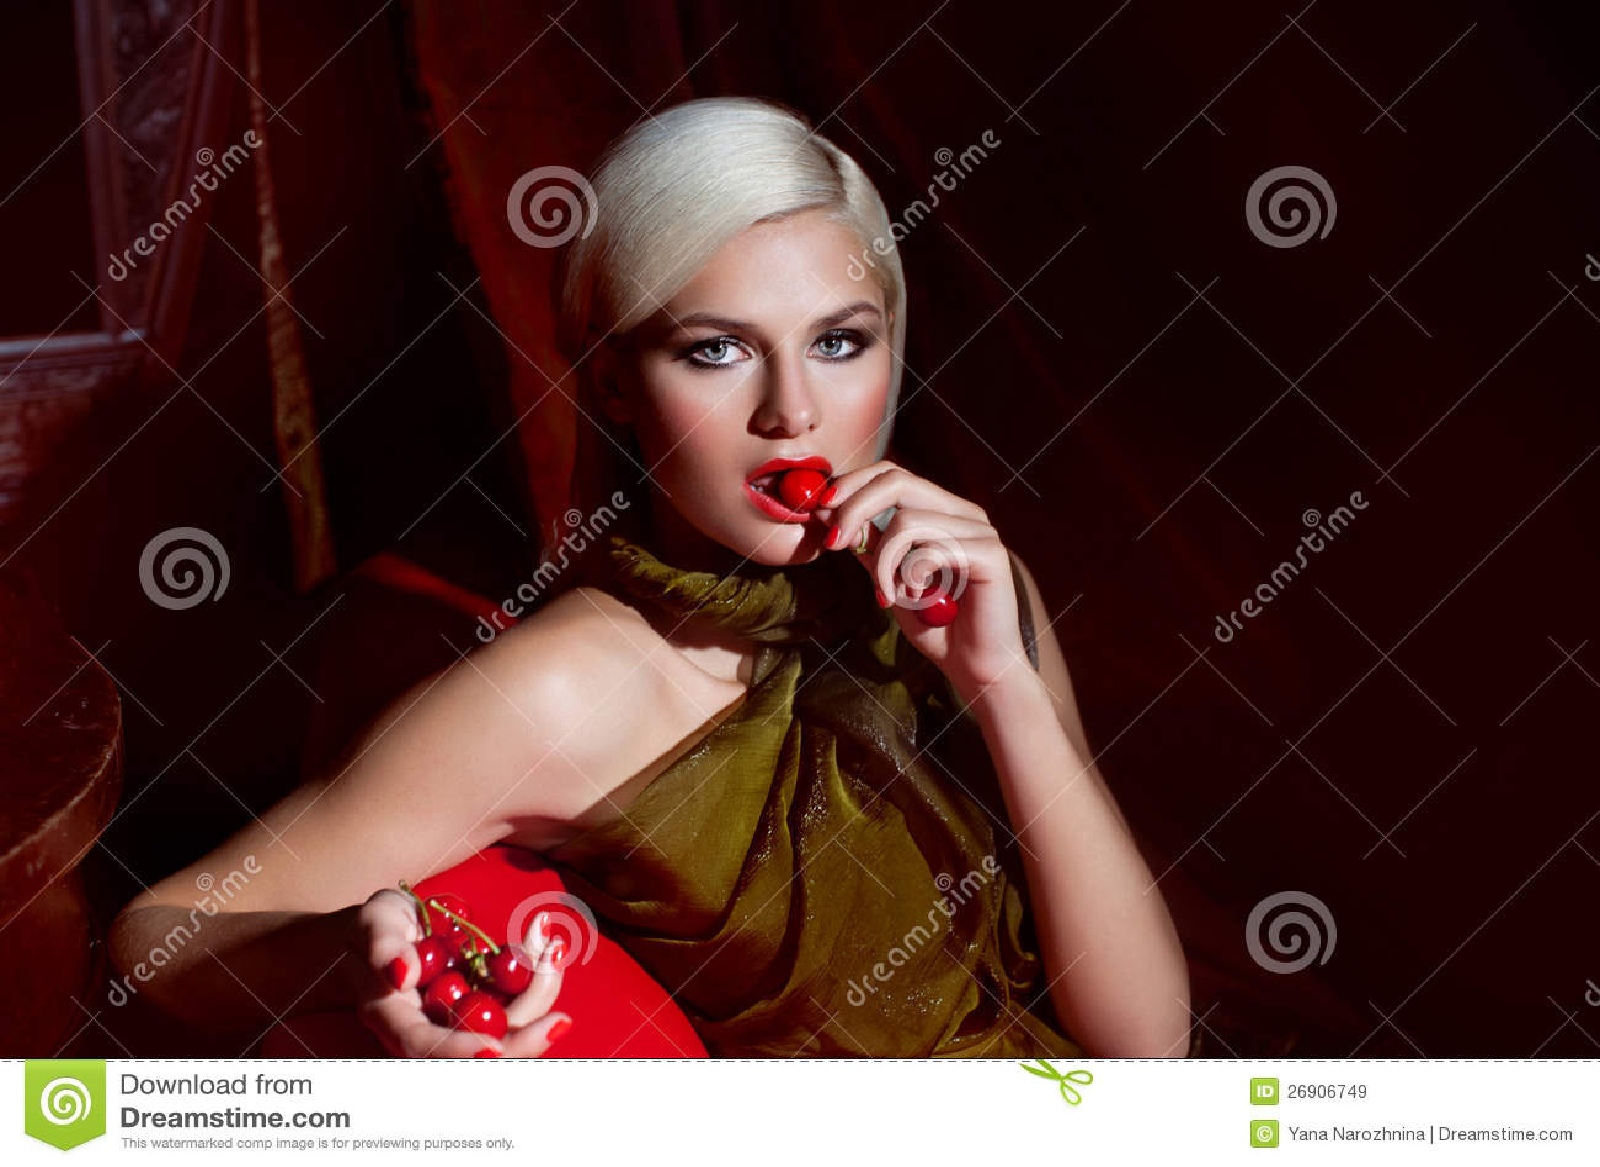 Cherry lady stock image. Image of beautifull, blonde